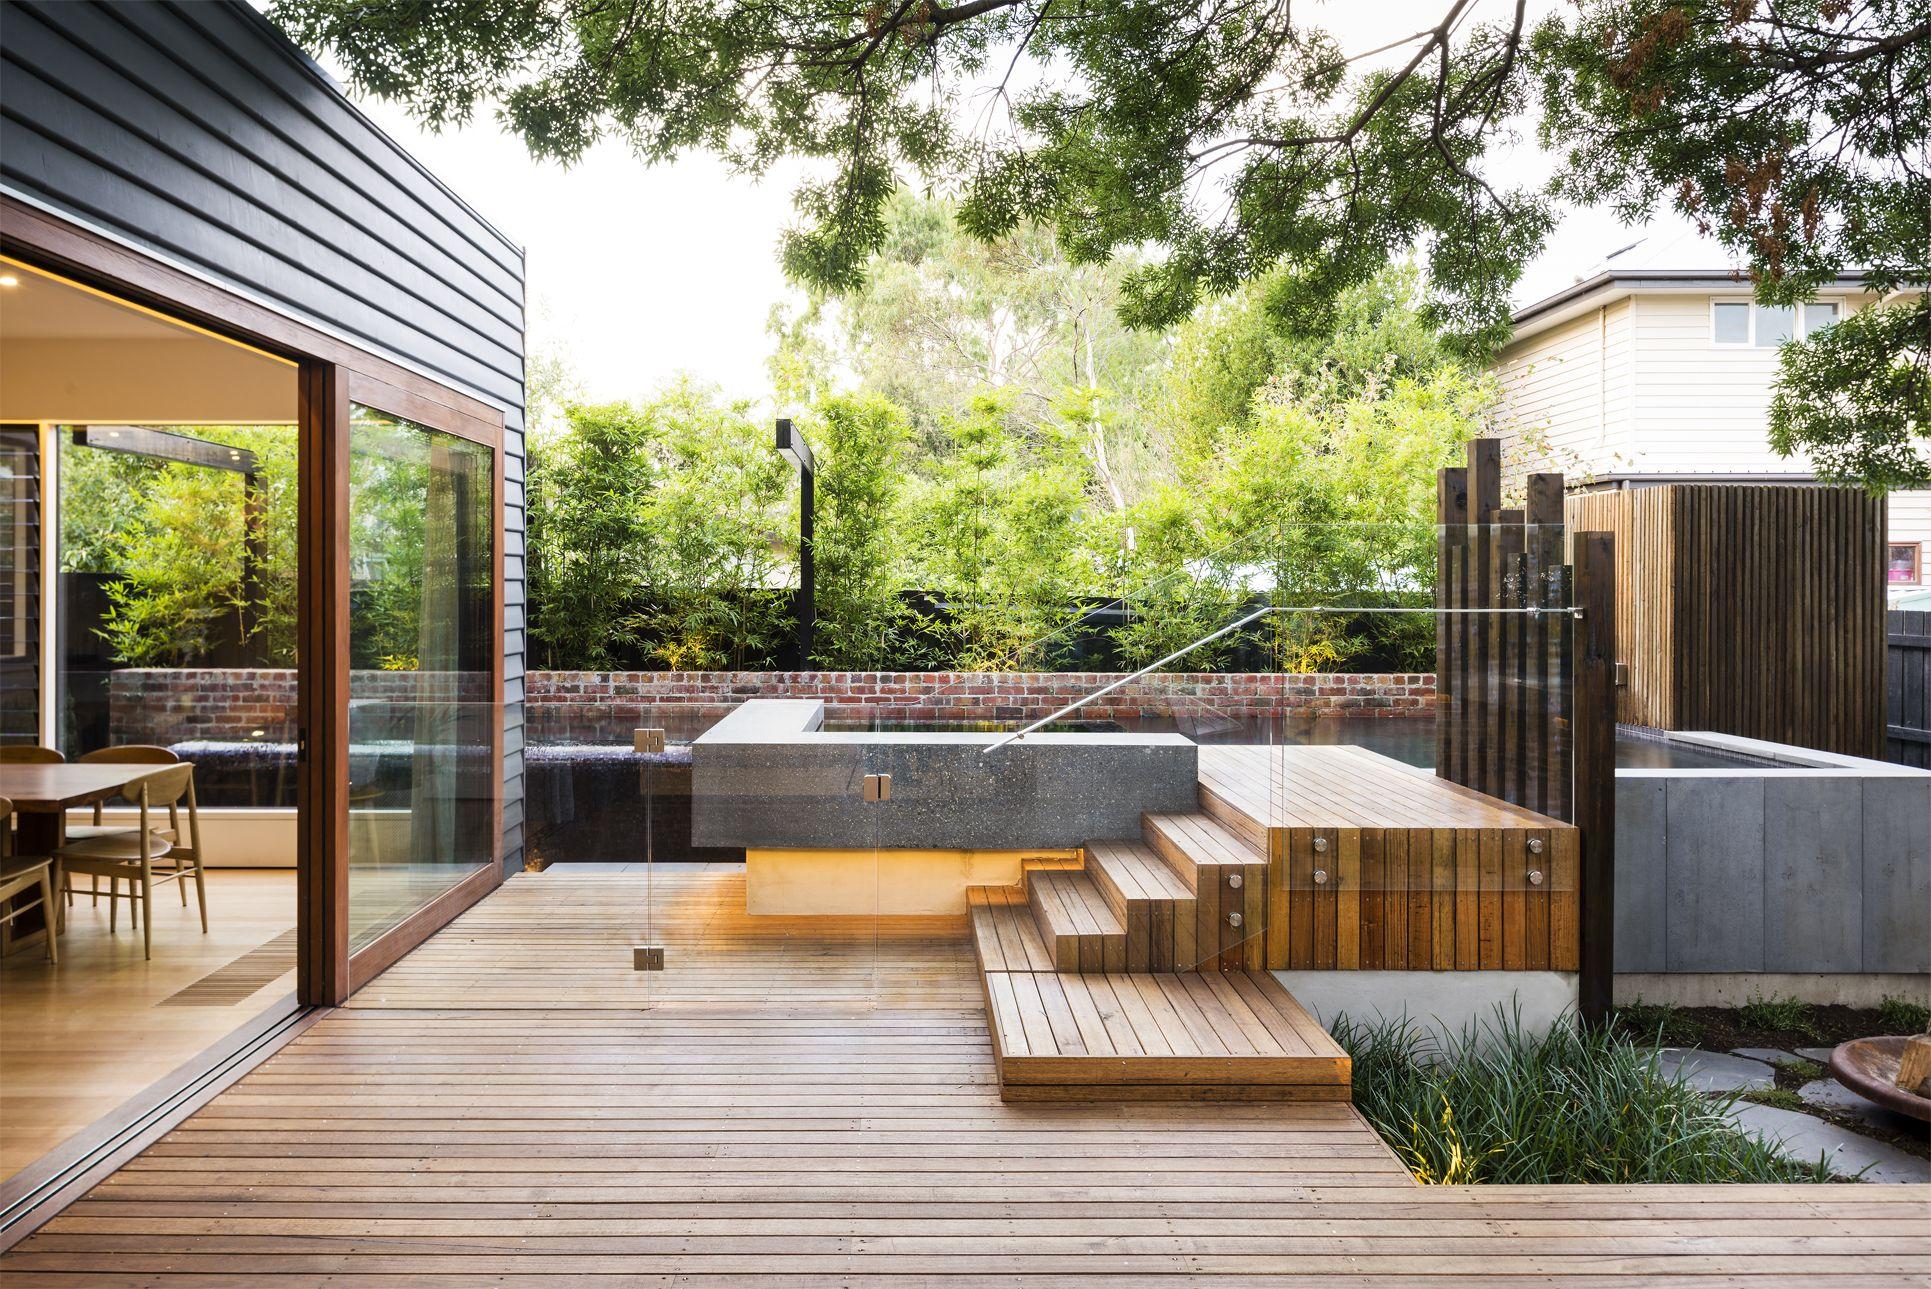 Frameless Glass Pool Fence Created By Frameless Impressions In Melbourne Modern Backyard Modern Backyard Design Modern Backyard Landscaping